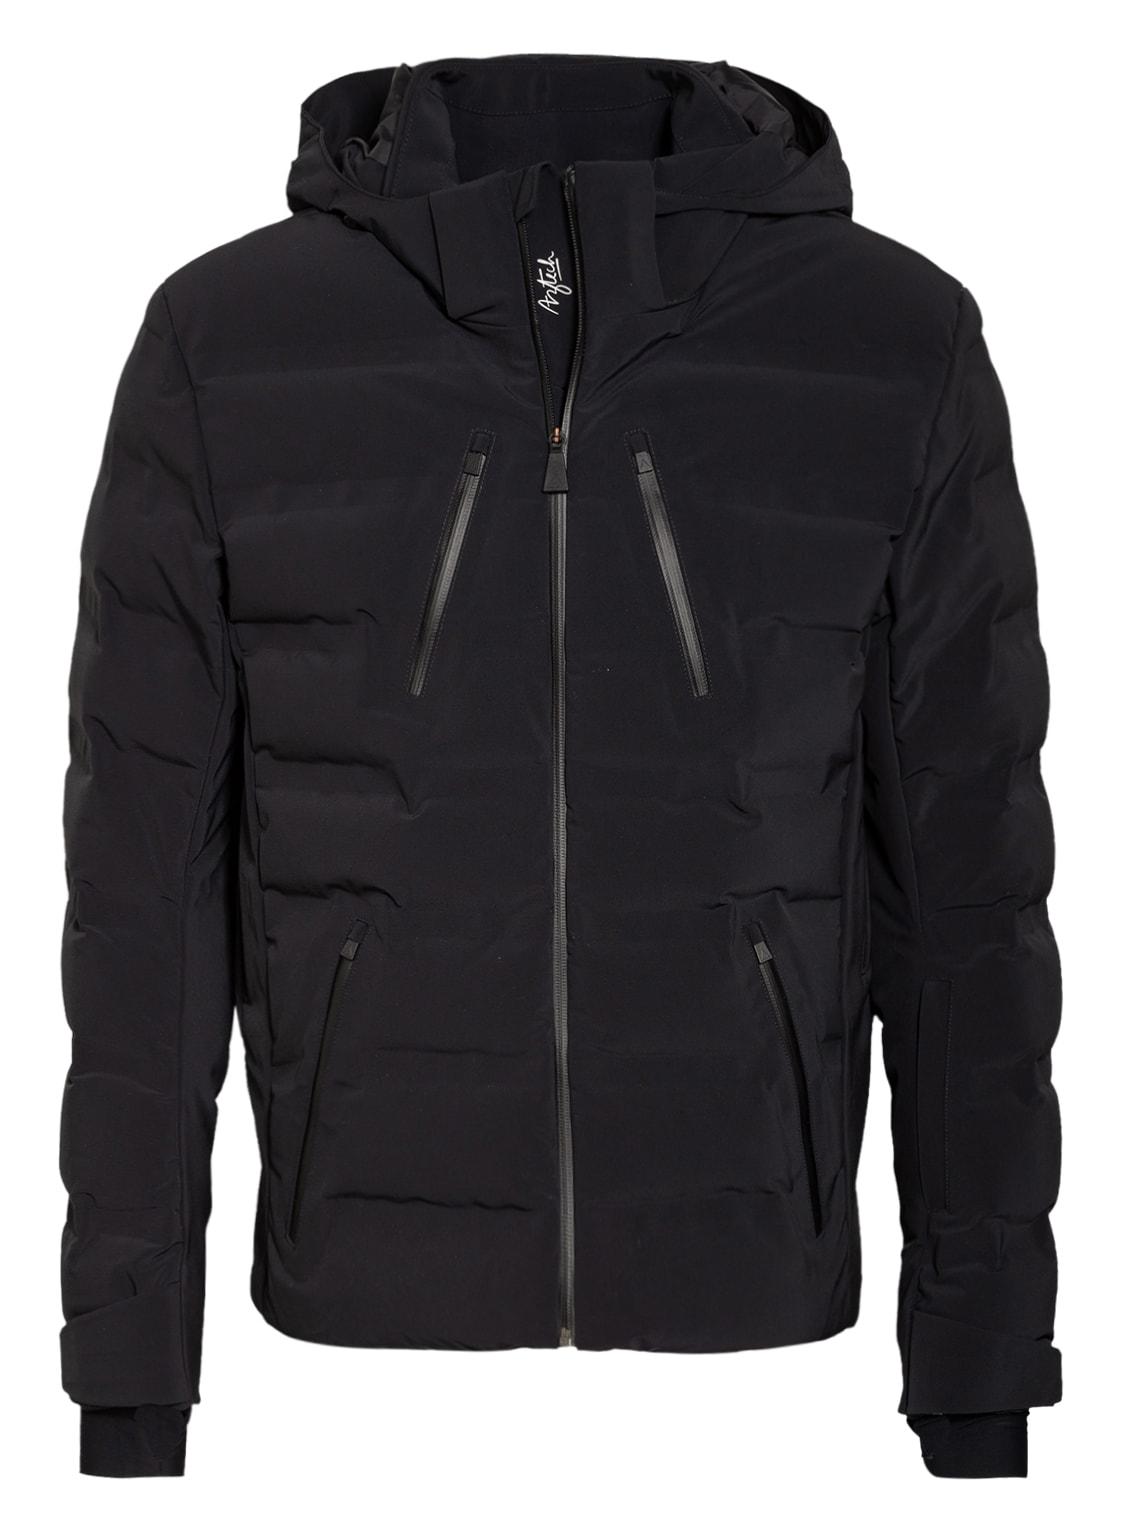 Image of Aztech Mountain Daunen-Skijacke Nuke Suit schwarz